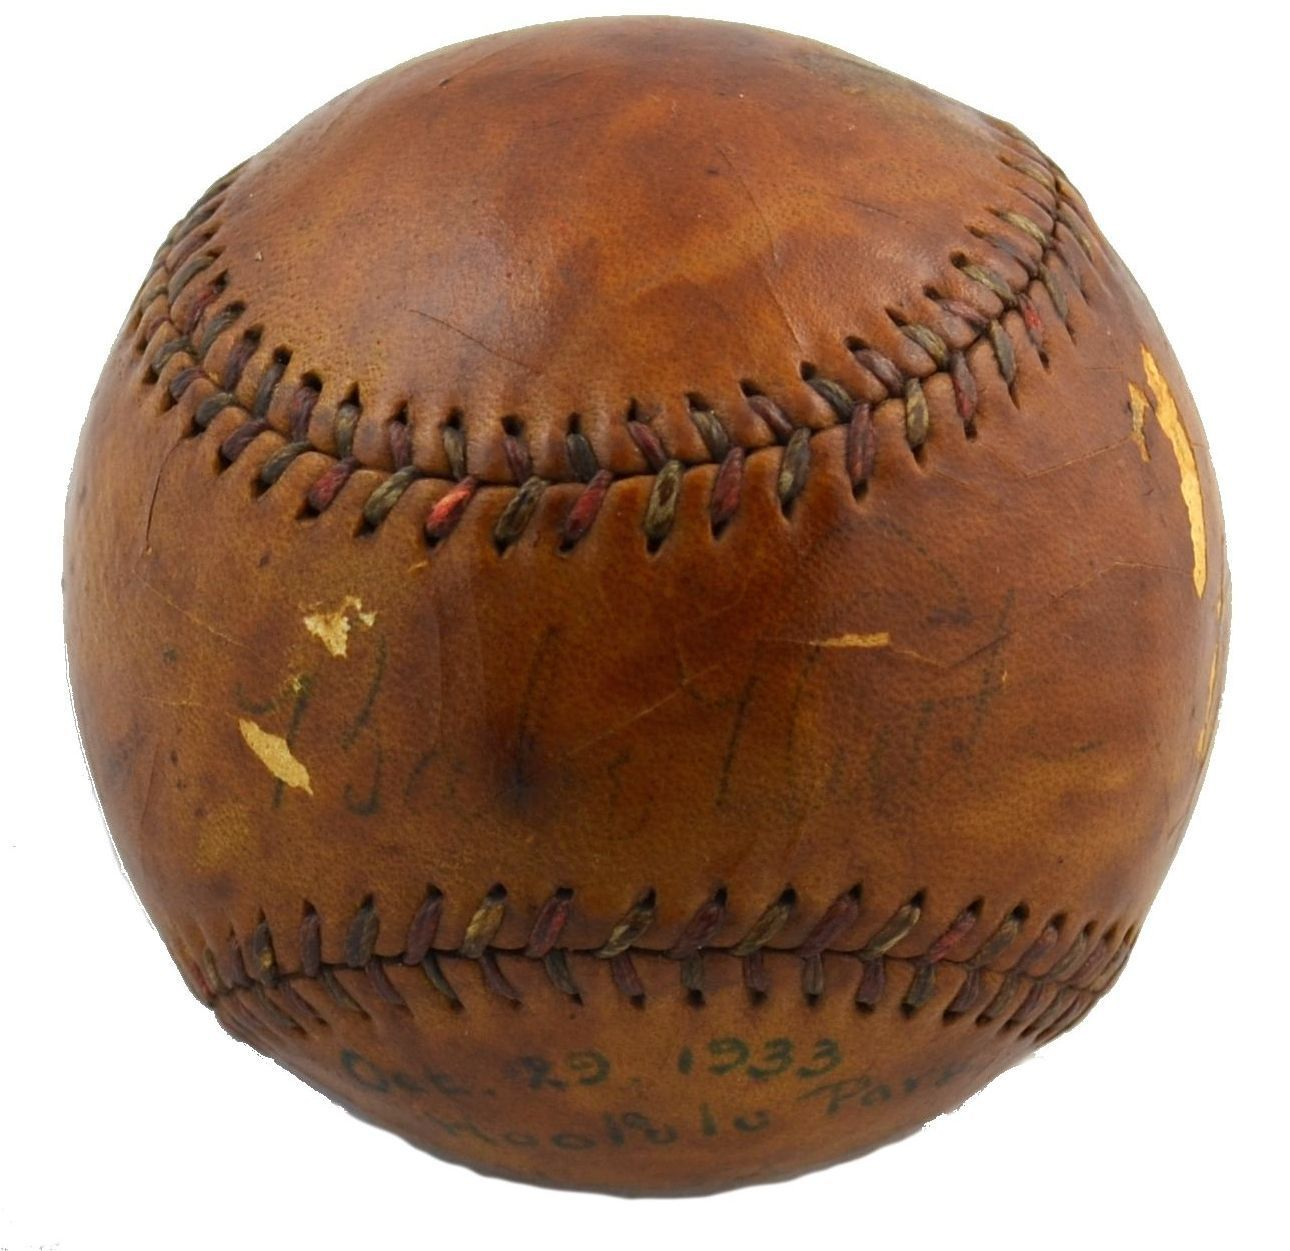 1933 Babe Ruth Single Signed Autographed American League Baseball PSA DNA COA